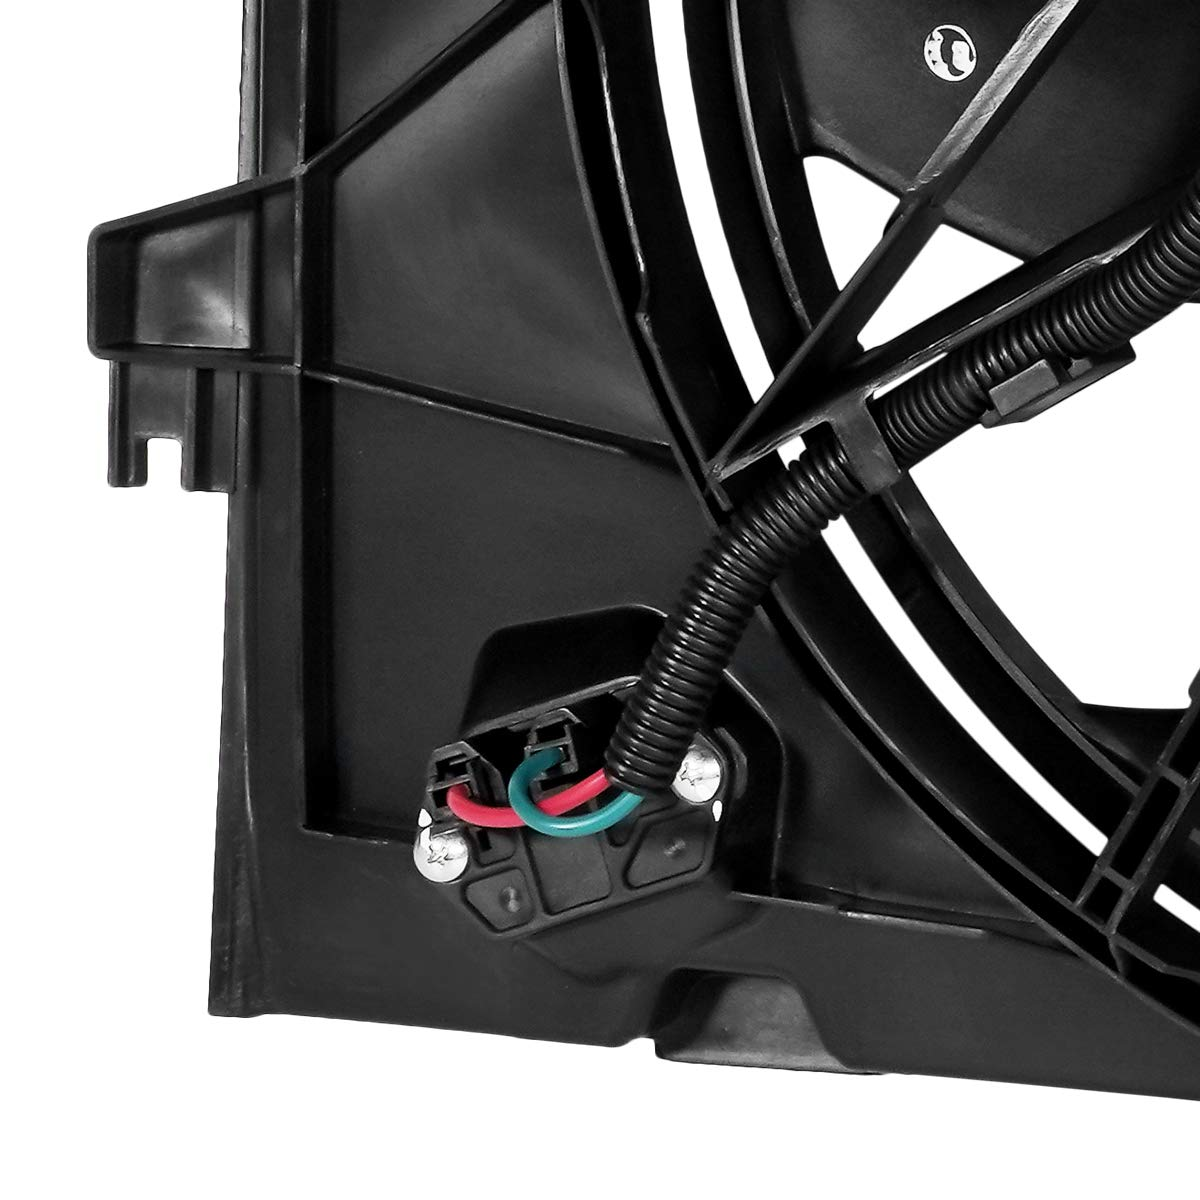 Dorman Cooling Fan Assembly New for Kia Sportage Hyundai 620-784